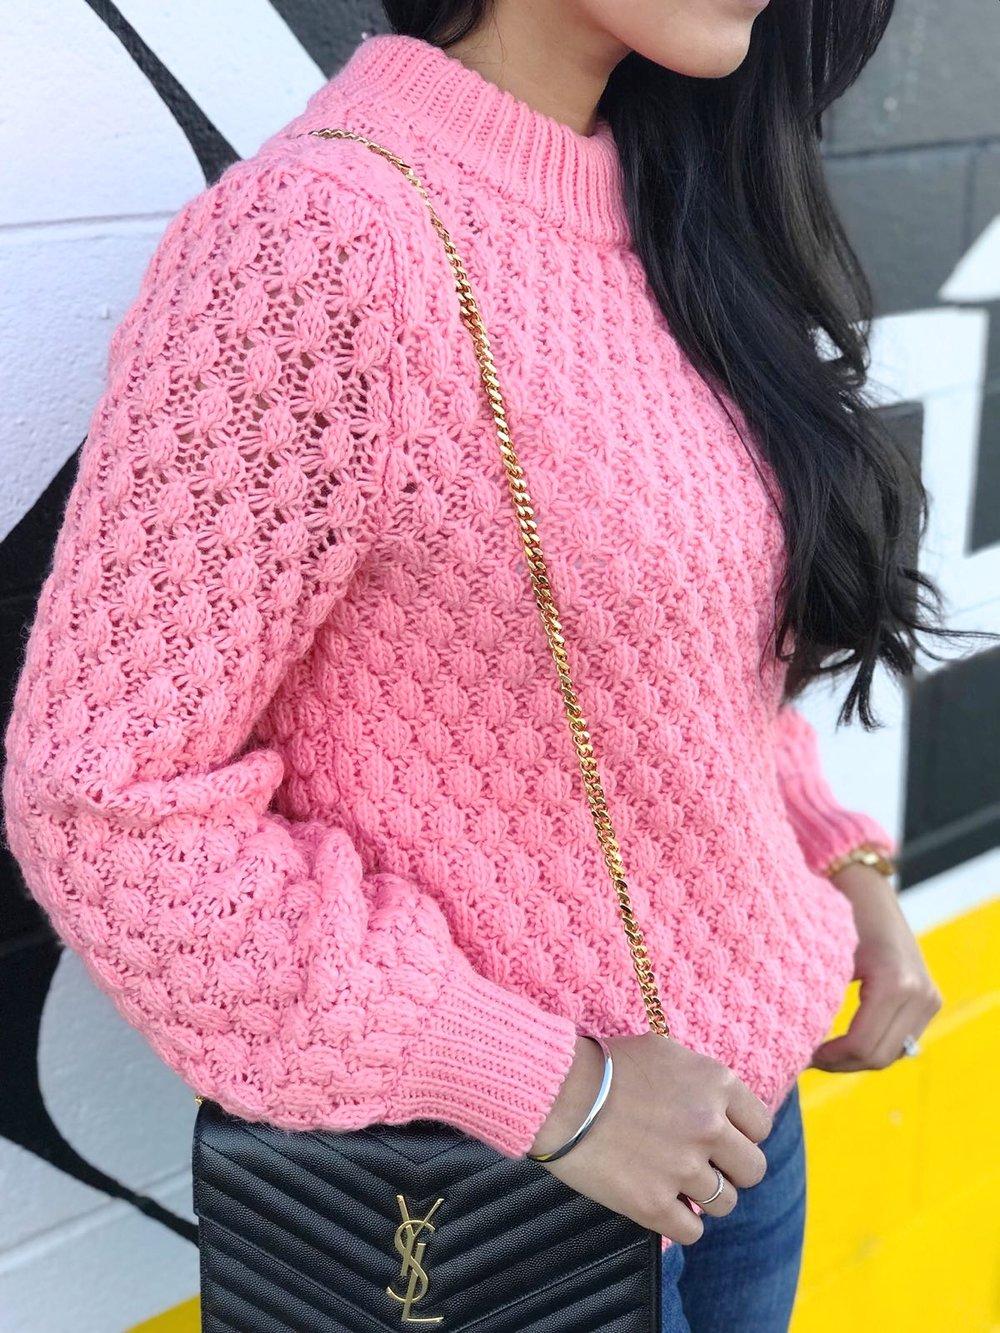 H&M-pink-knit-sweater